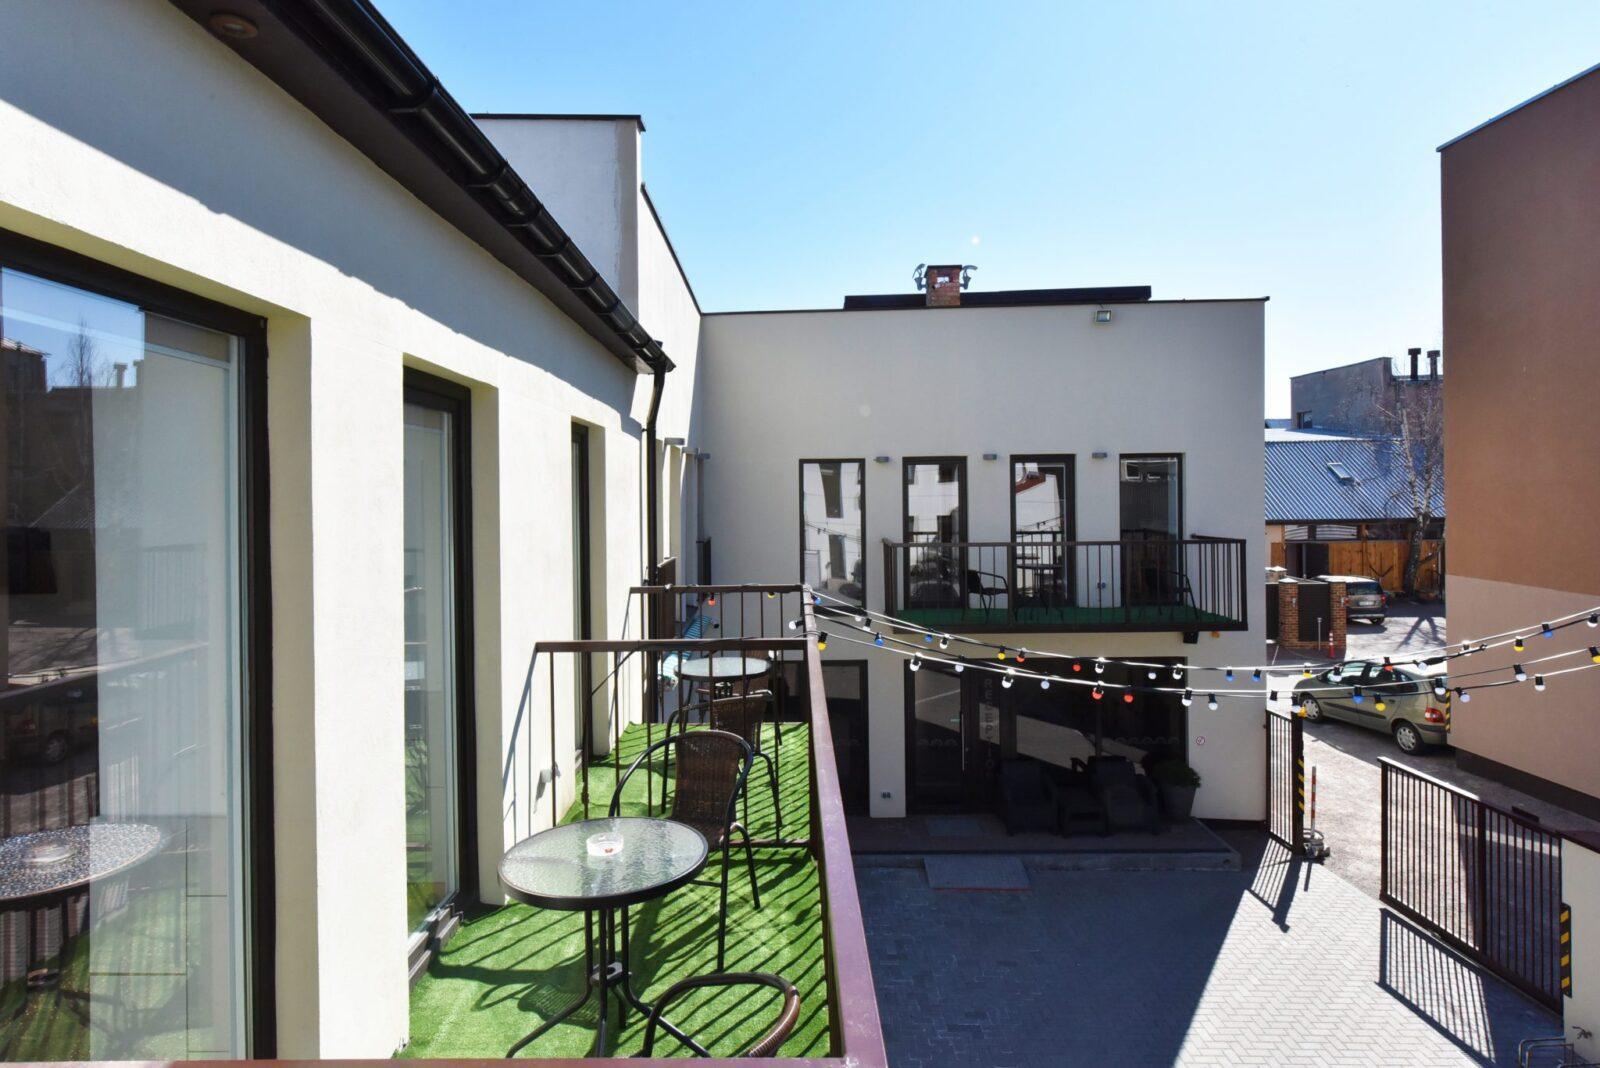 Dvivietis 208 numeris, su balkonu | poilsis-palangoje.com